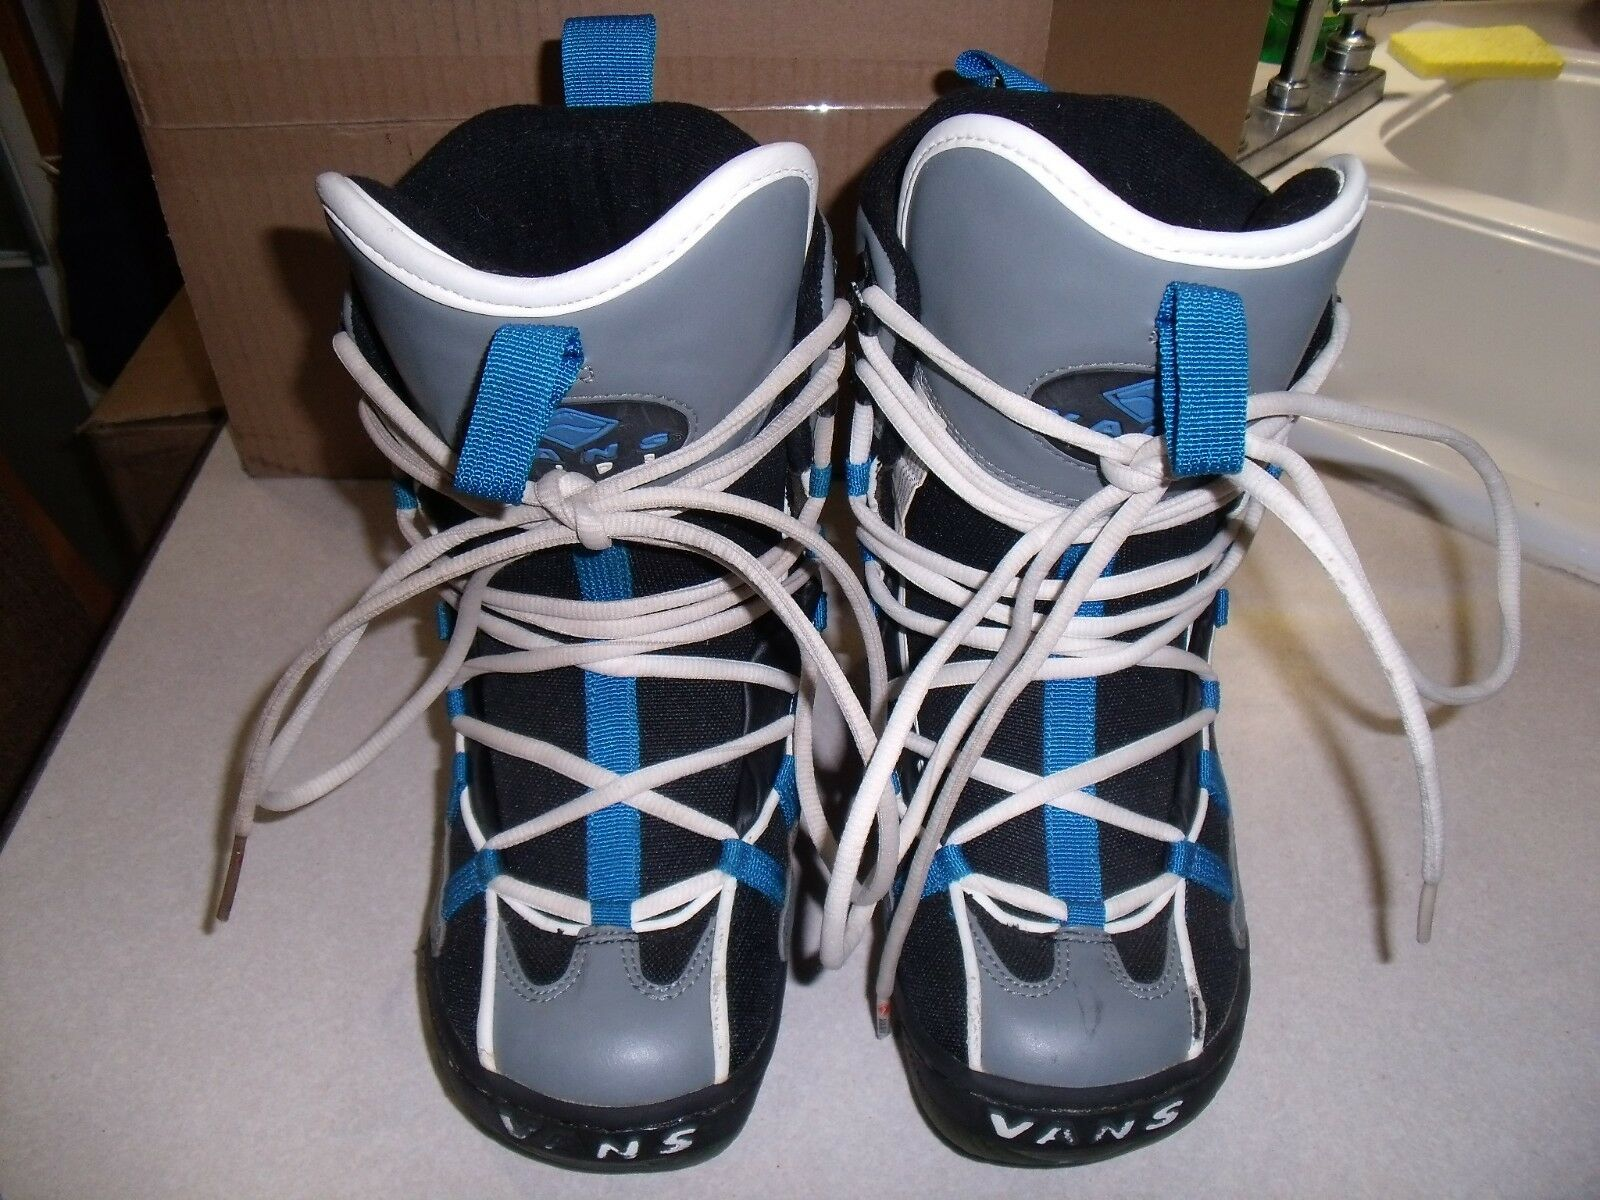 Vans boy's Snowboard Boots - size US-5